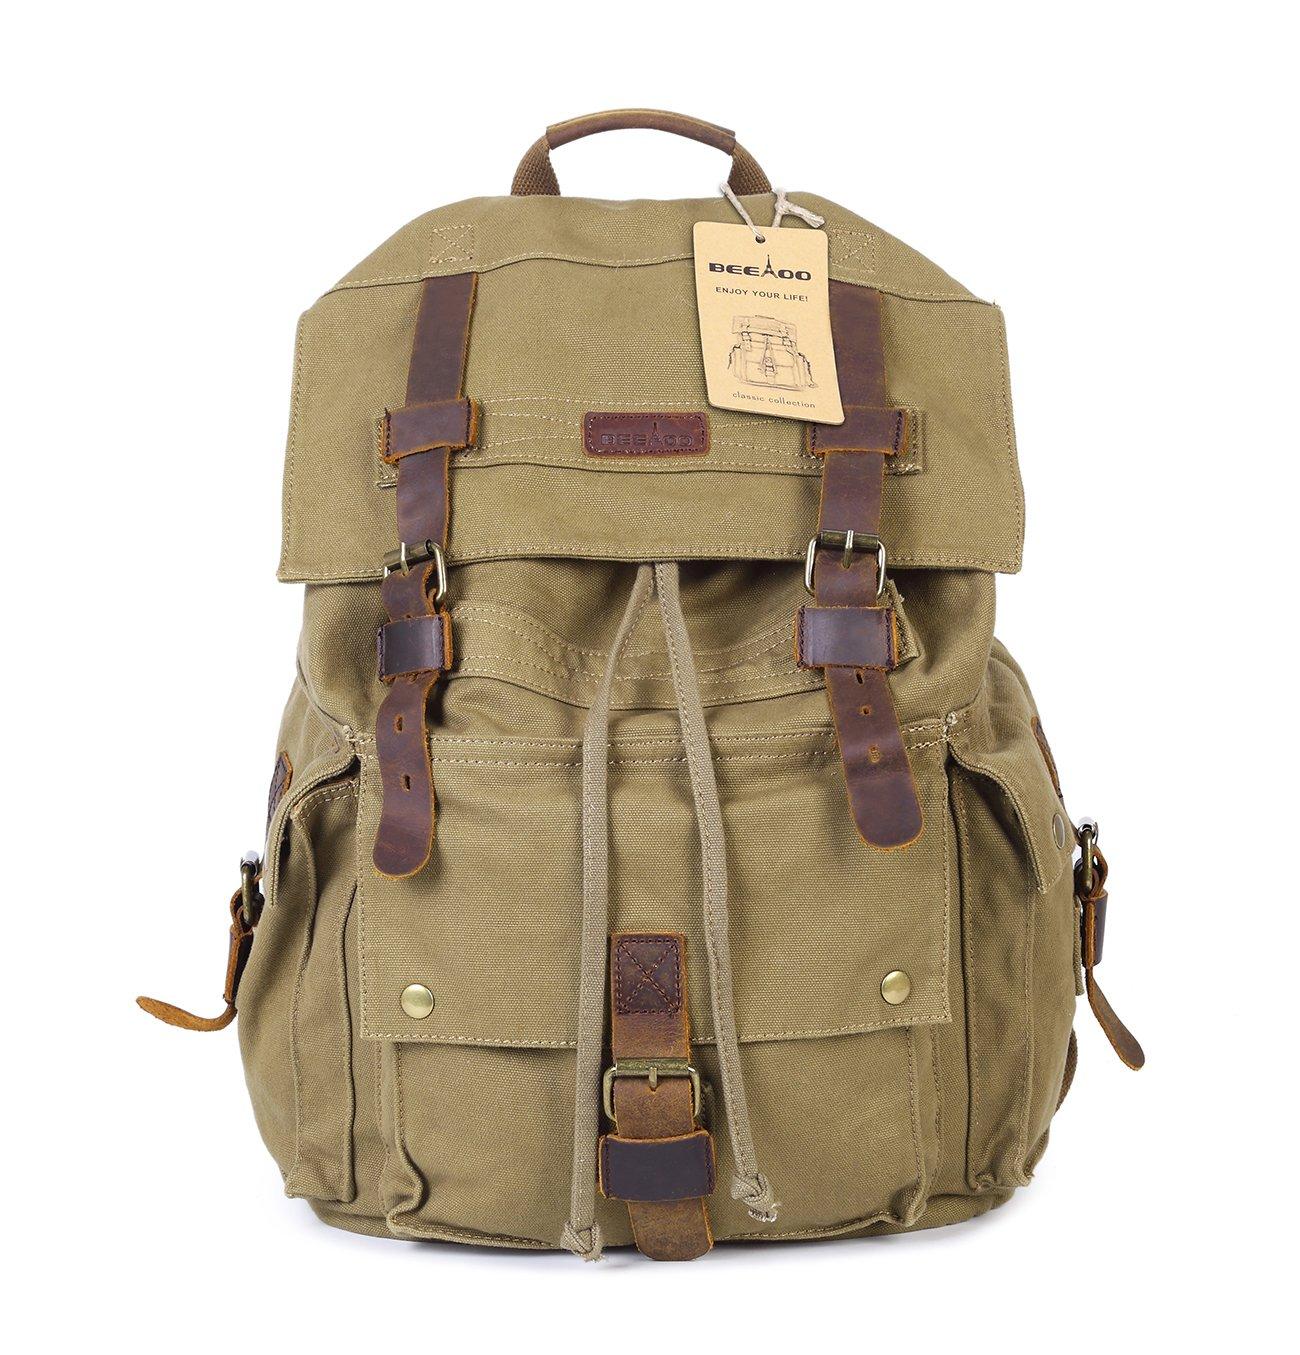 Beeaoo Canvas Backpack Bag,Rucksack, Travel Bag For Hiking, Camping,Durable Heavy Duty Multipurpose (Green)